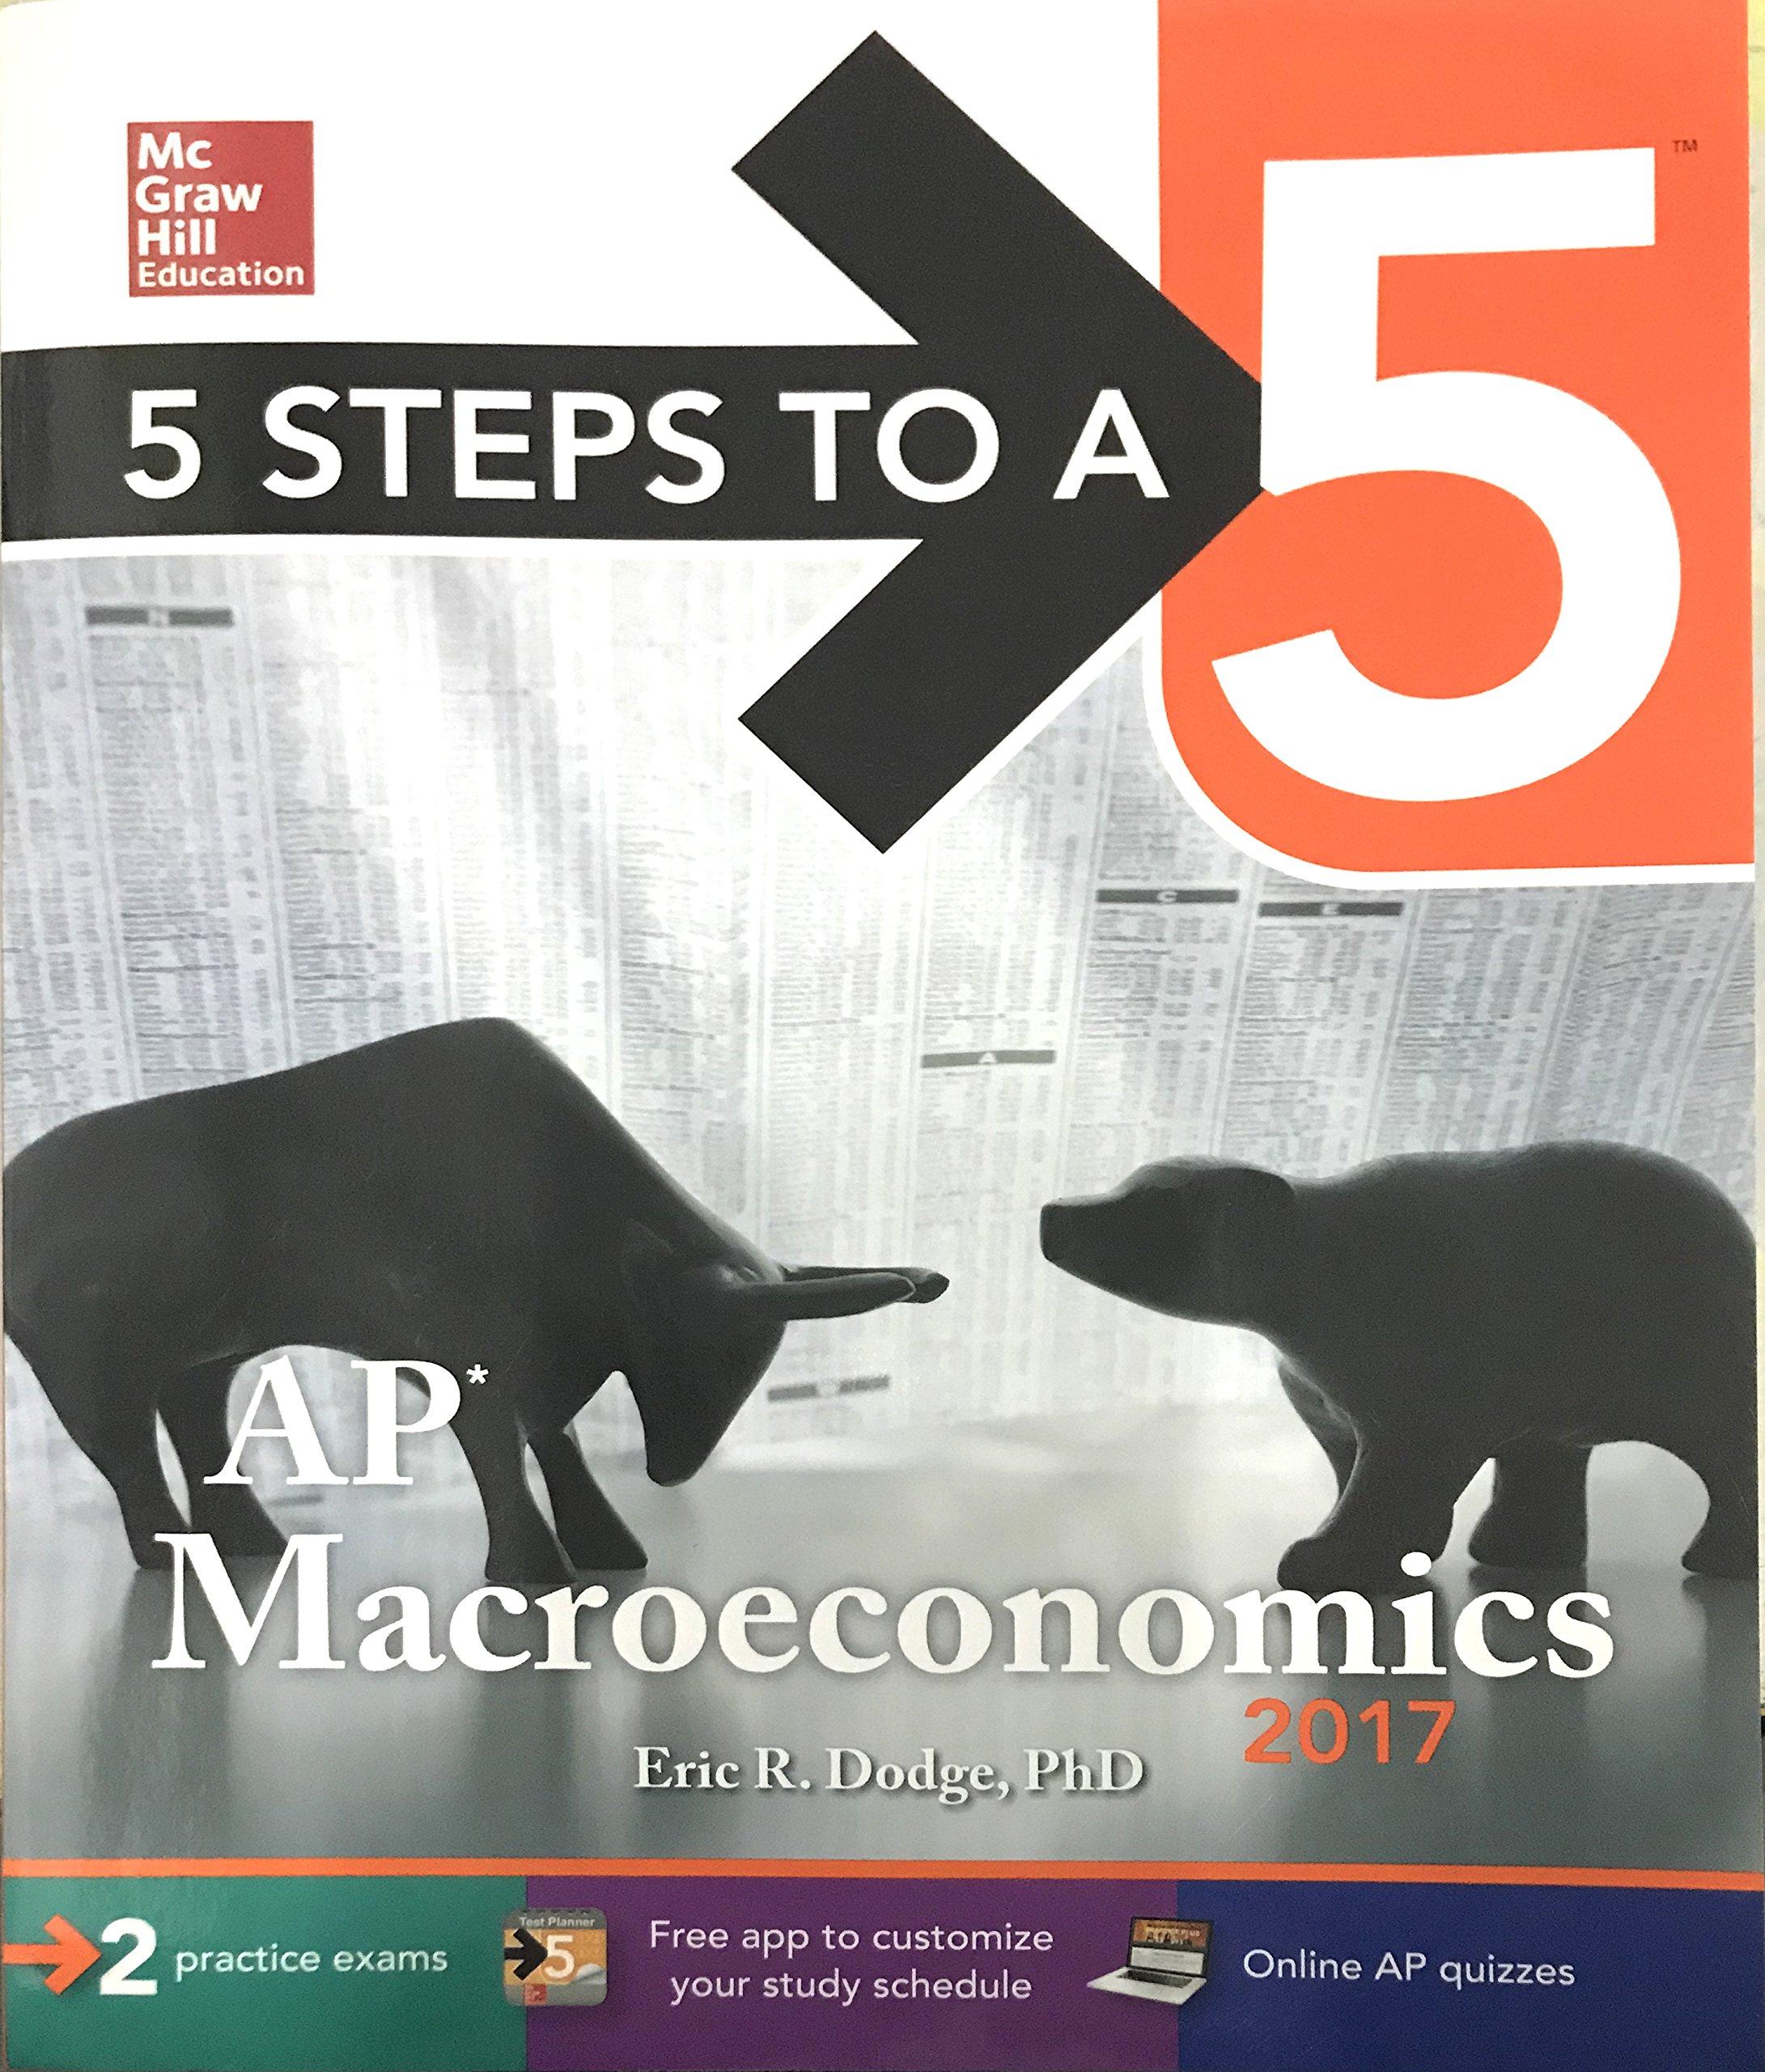 5 Steps to a 5: AP Macroeconomics 2017: Eric R. Dodge: 9781259583537: Books  - Amazon.ca